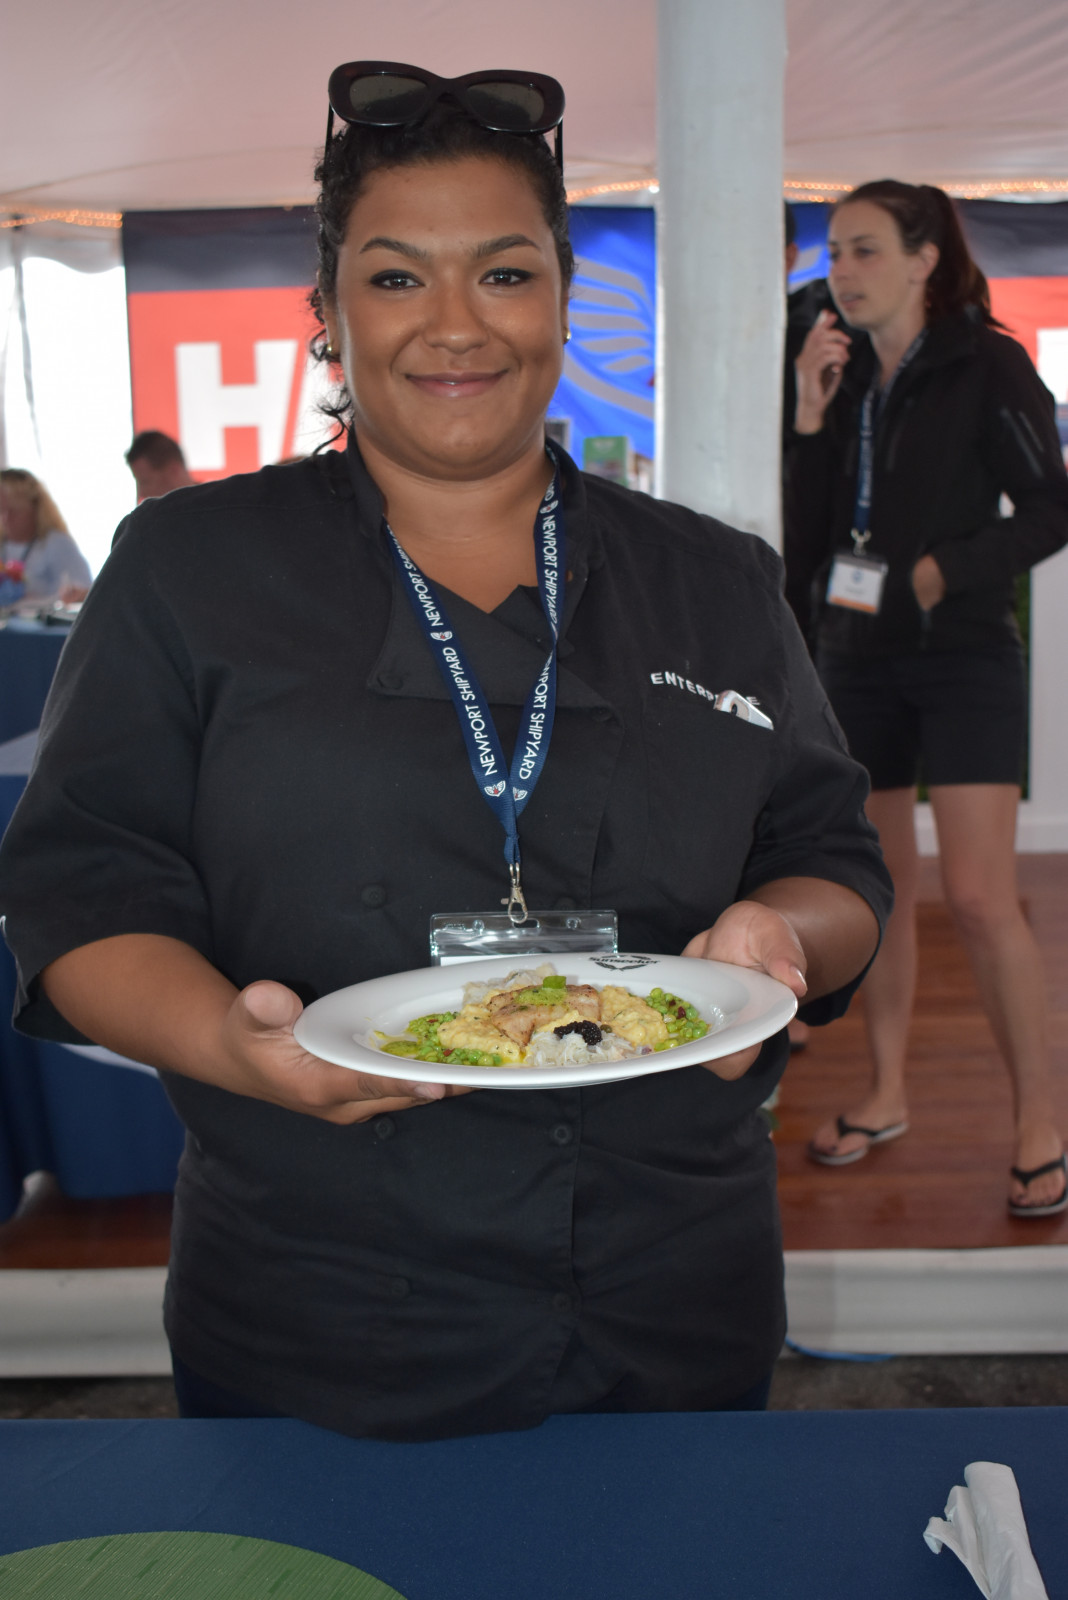 Newport19: MY Enterprise chef wins competition